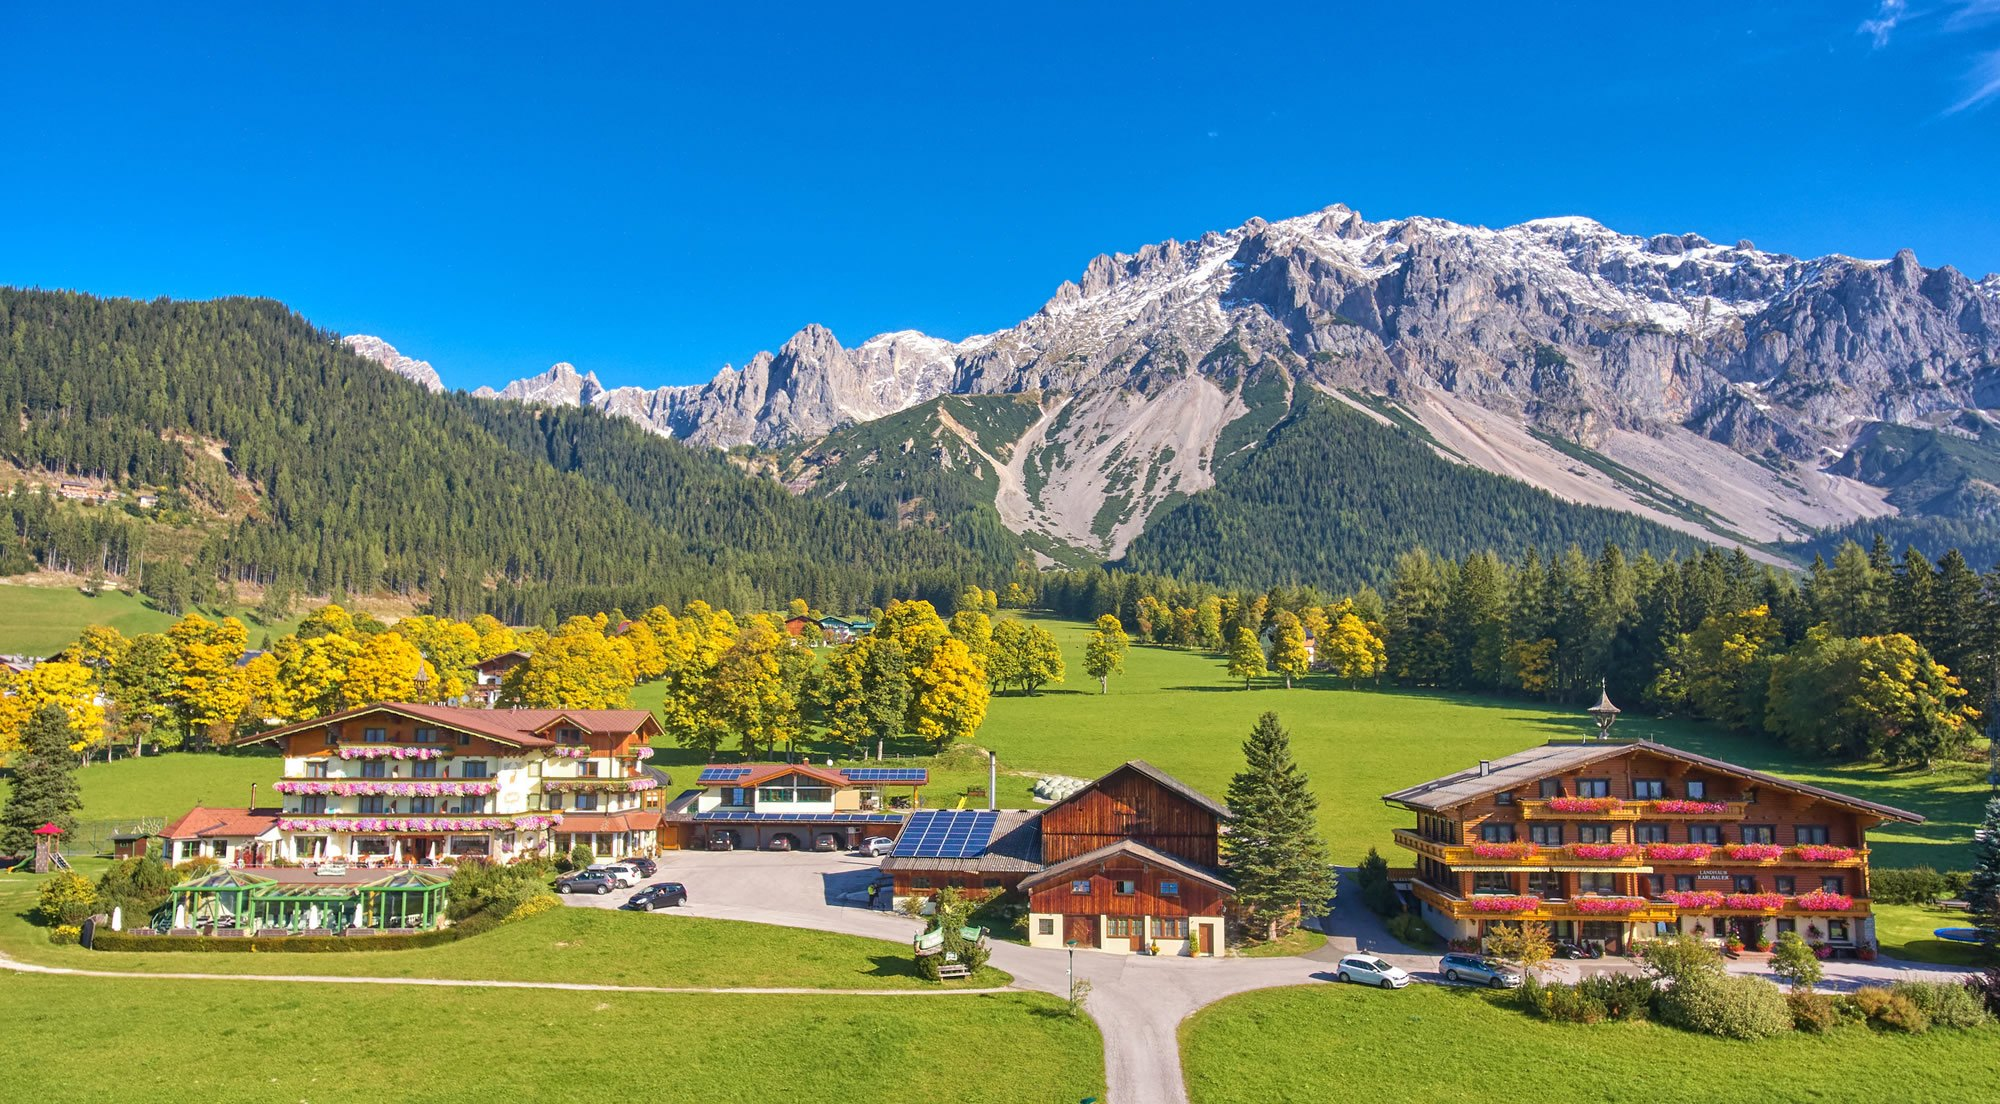 Hotel Pension Jagdhof Landhaus Karlbauer Ramsau am Dachstein